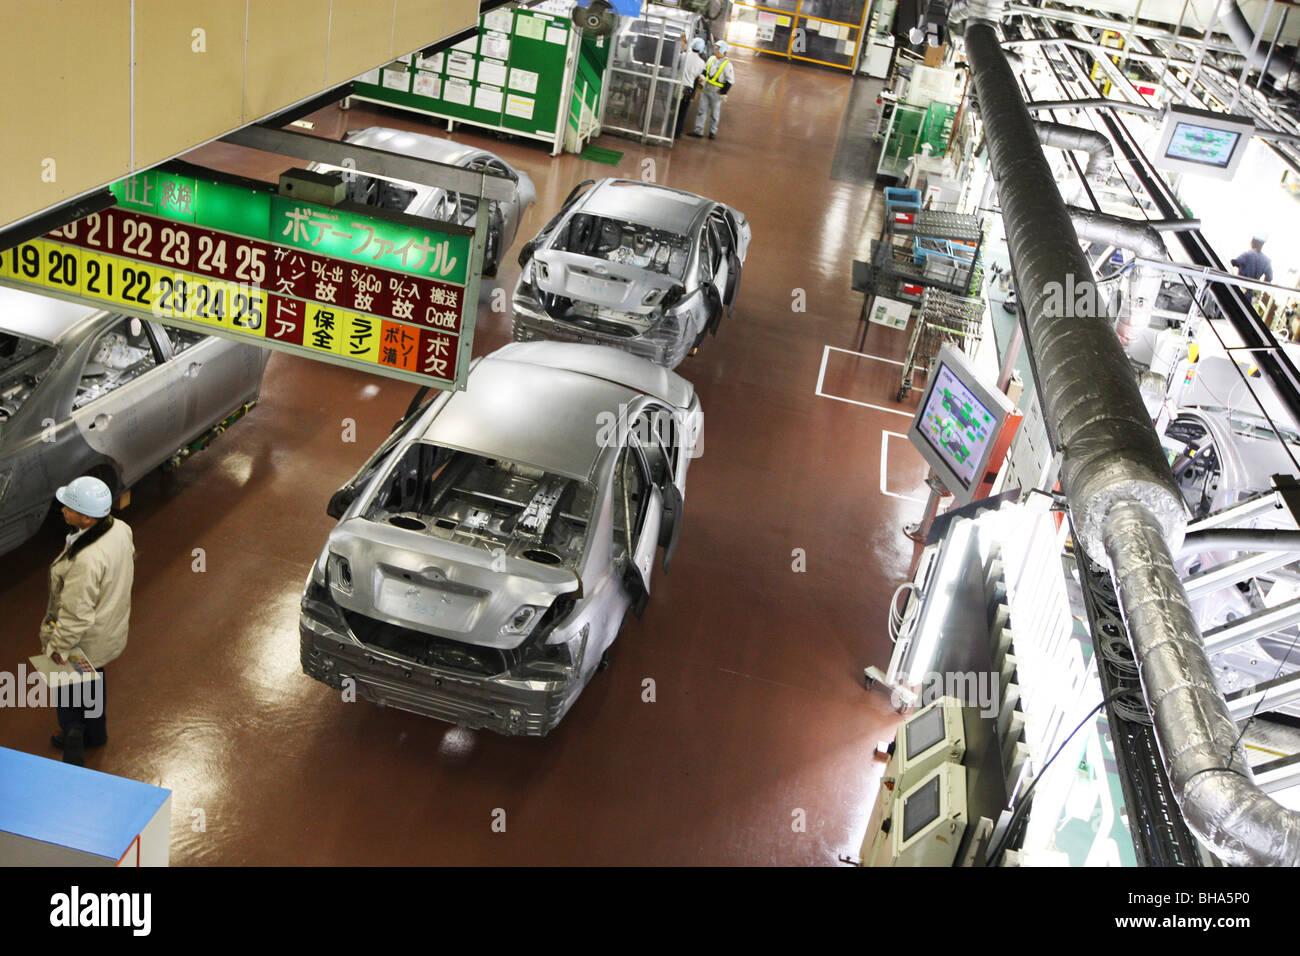 Production Line Of Tsutsumi Plant At Toyota Motor Company